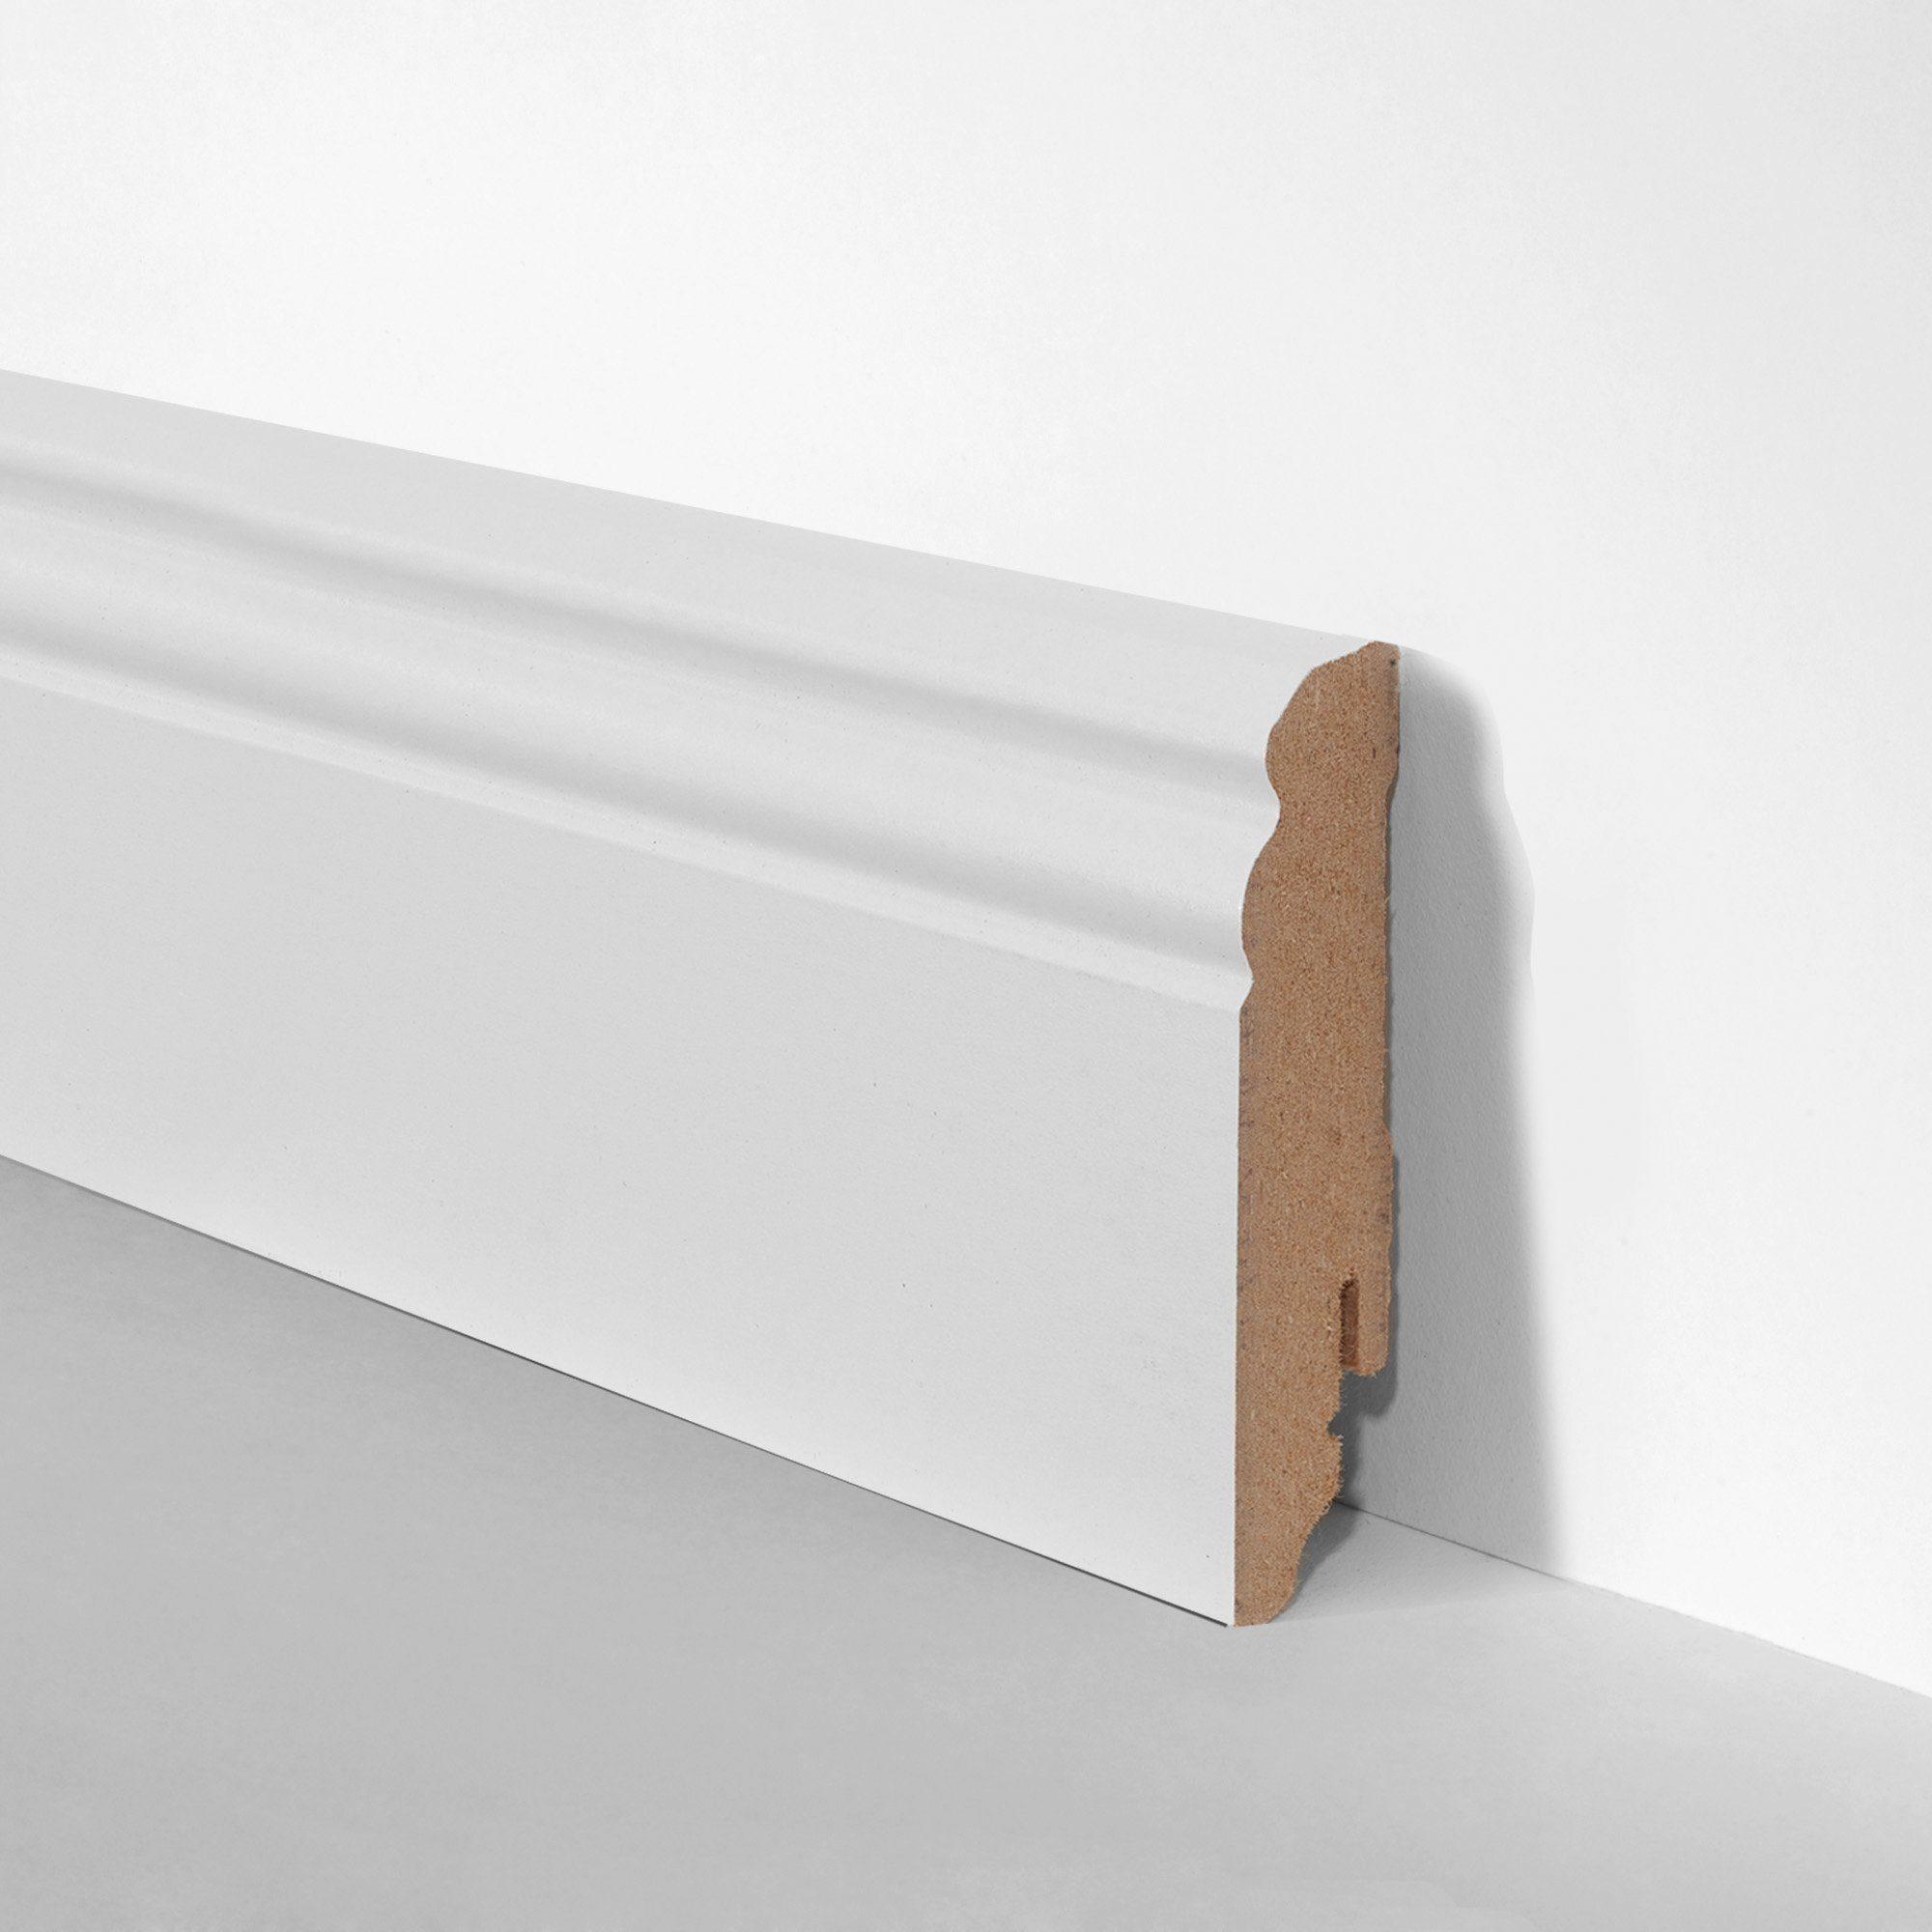 BODENMEISTER Set: Sockelleiste »Hamburger Profil weiß«, 3er-Pack, Höhe: 8 cm